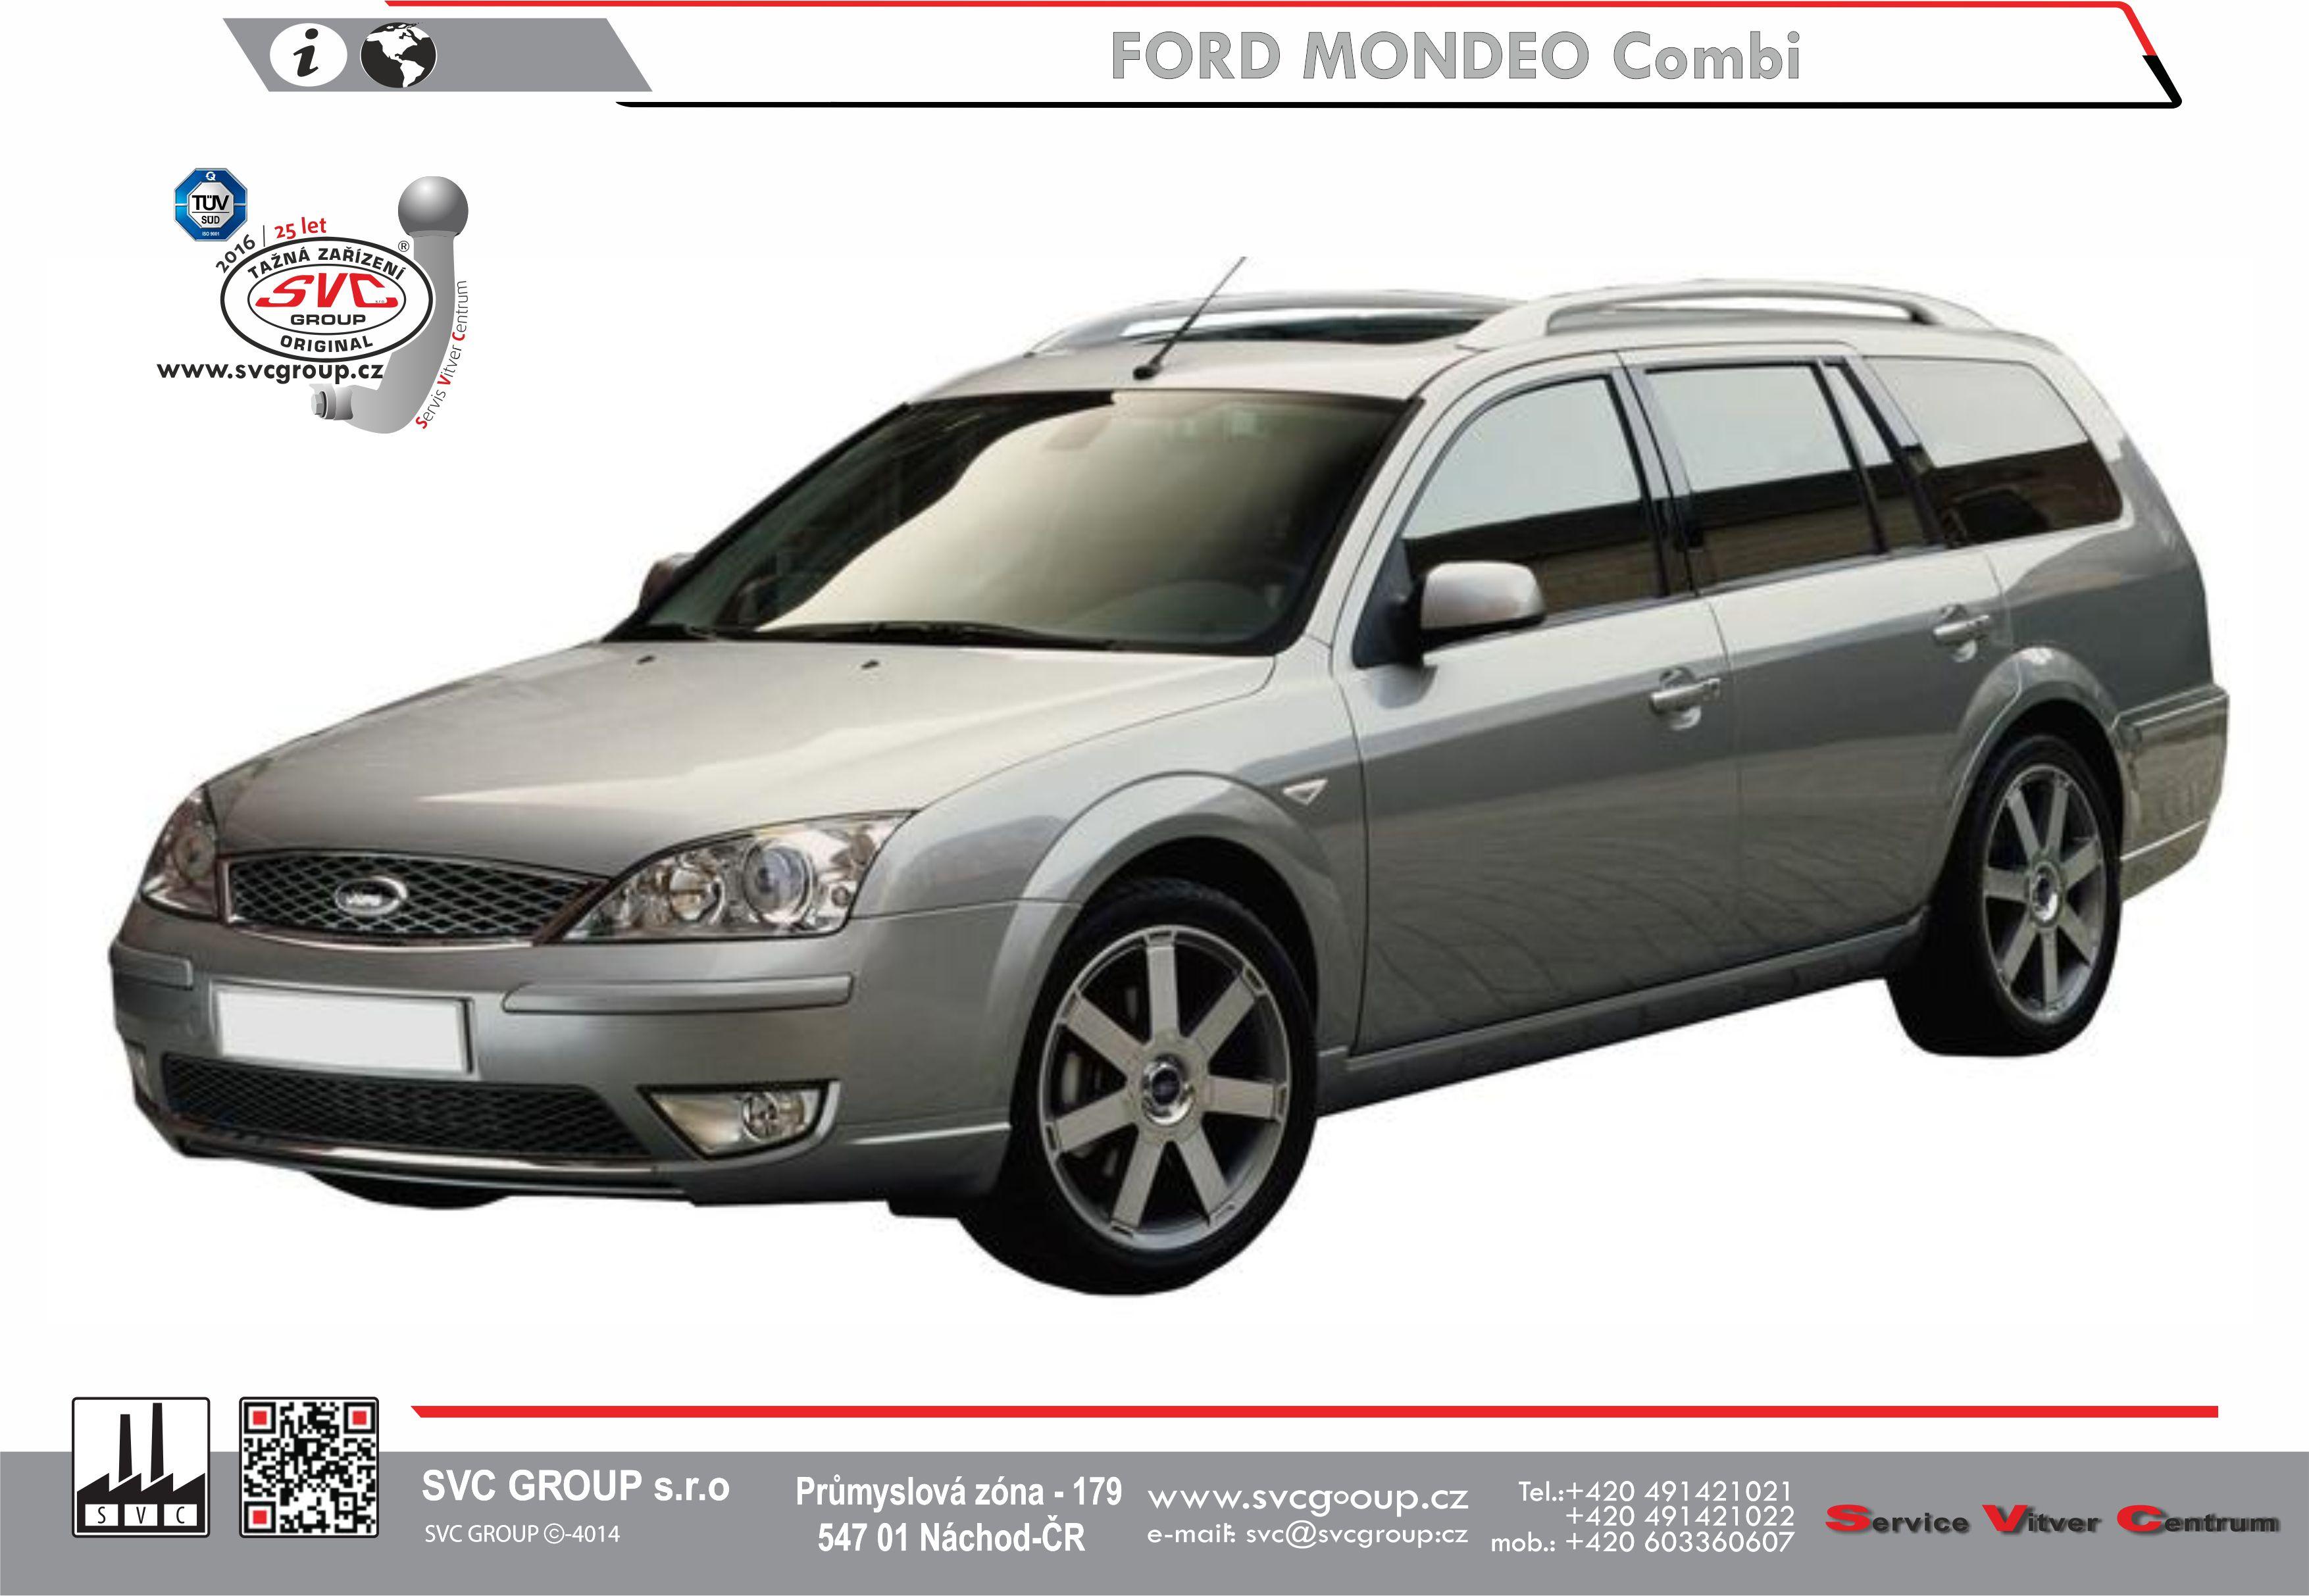 Ford Mondeo Kombi